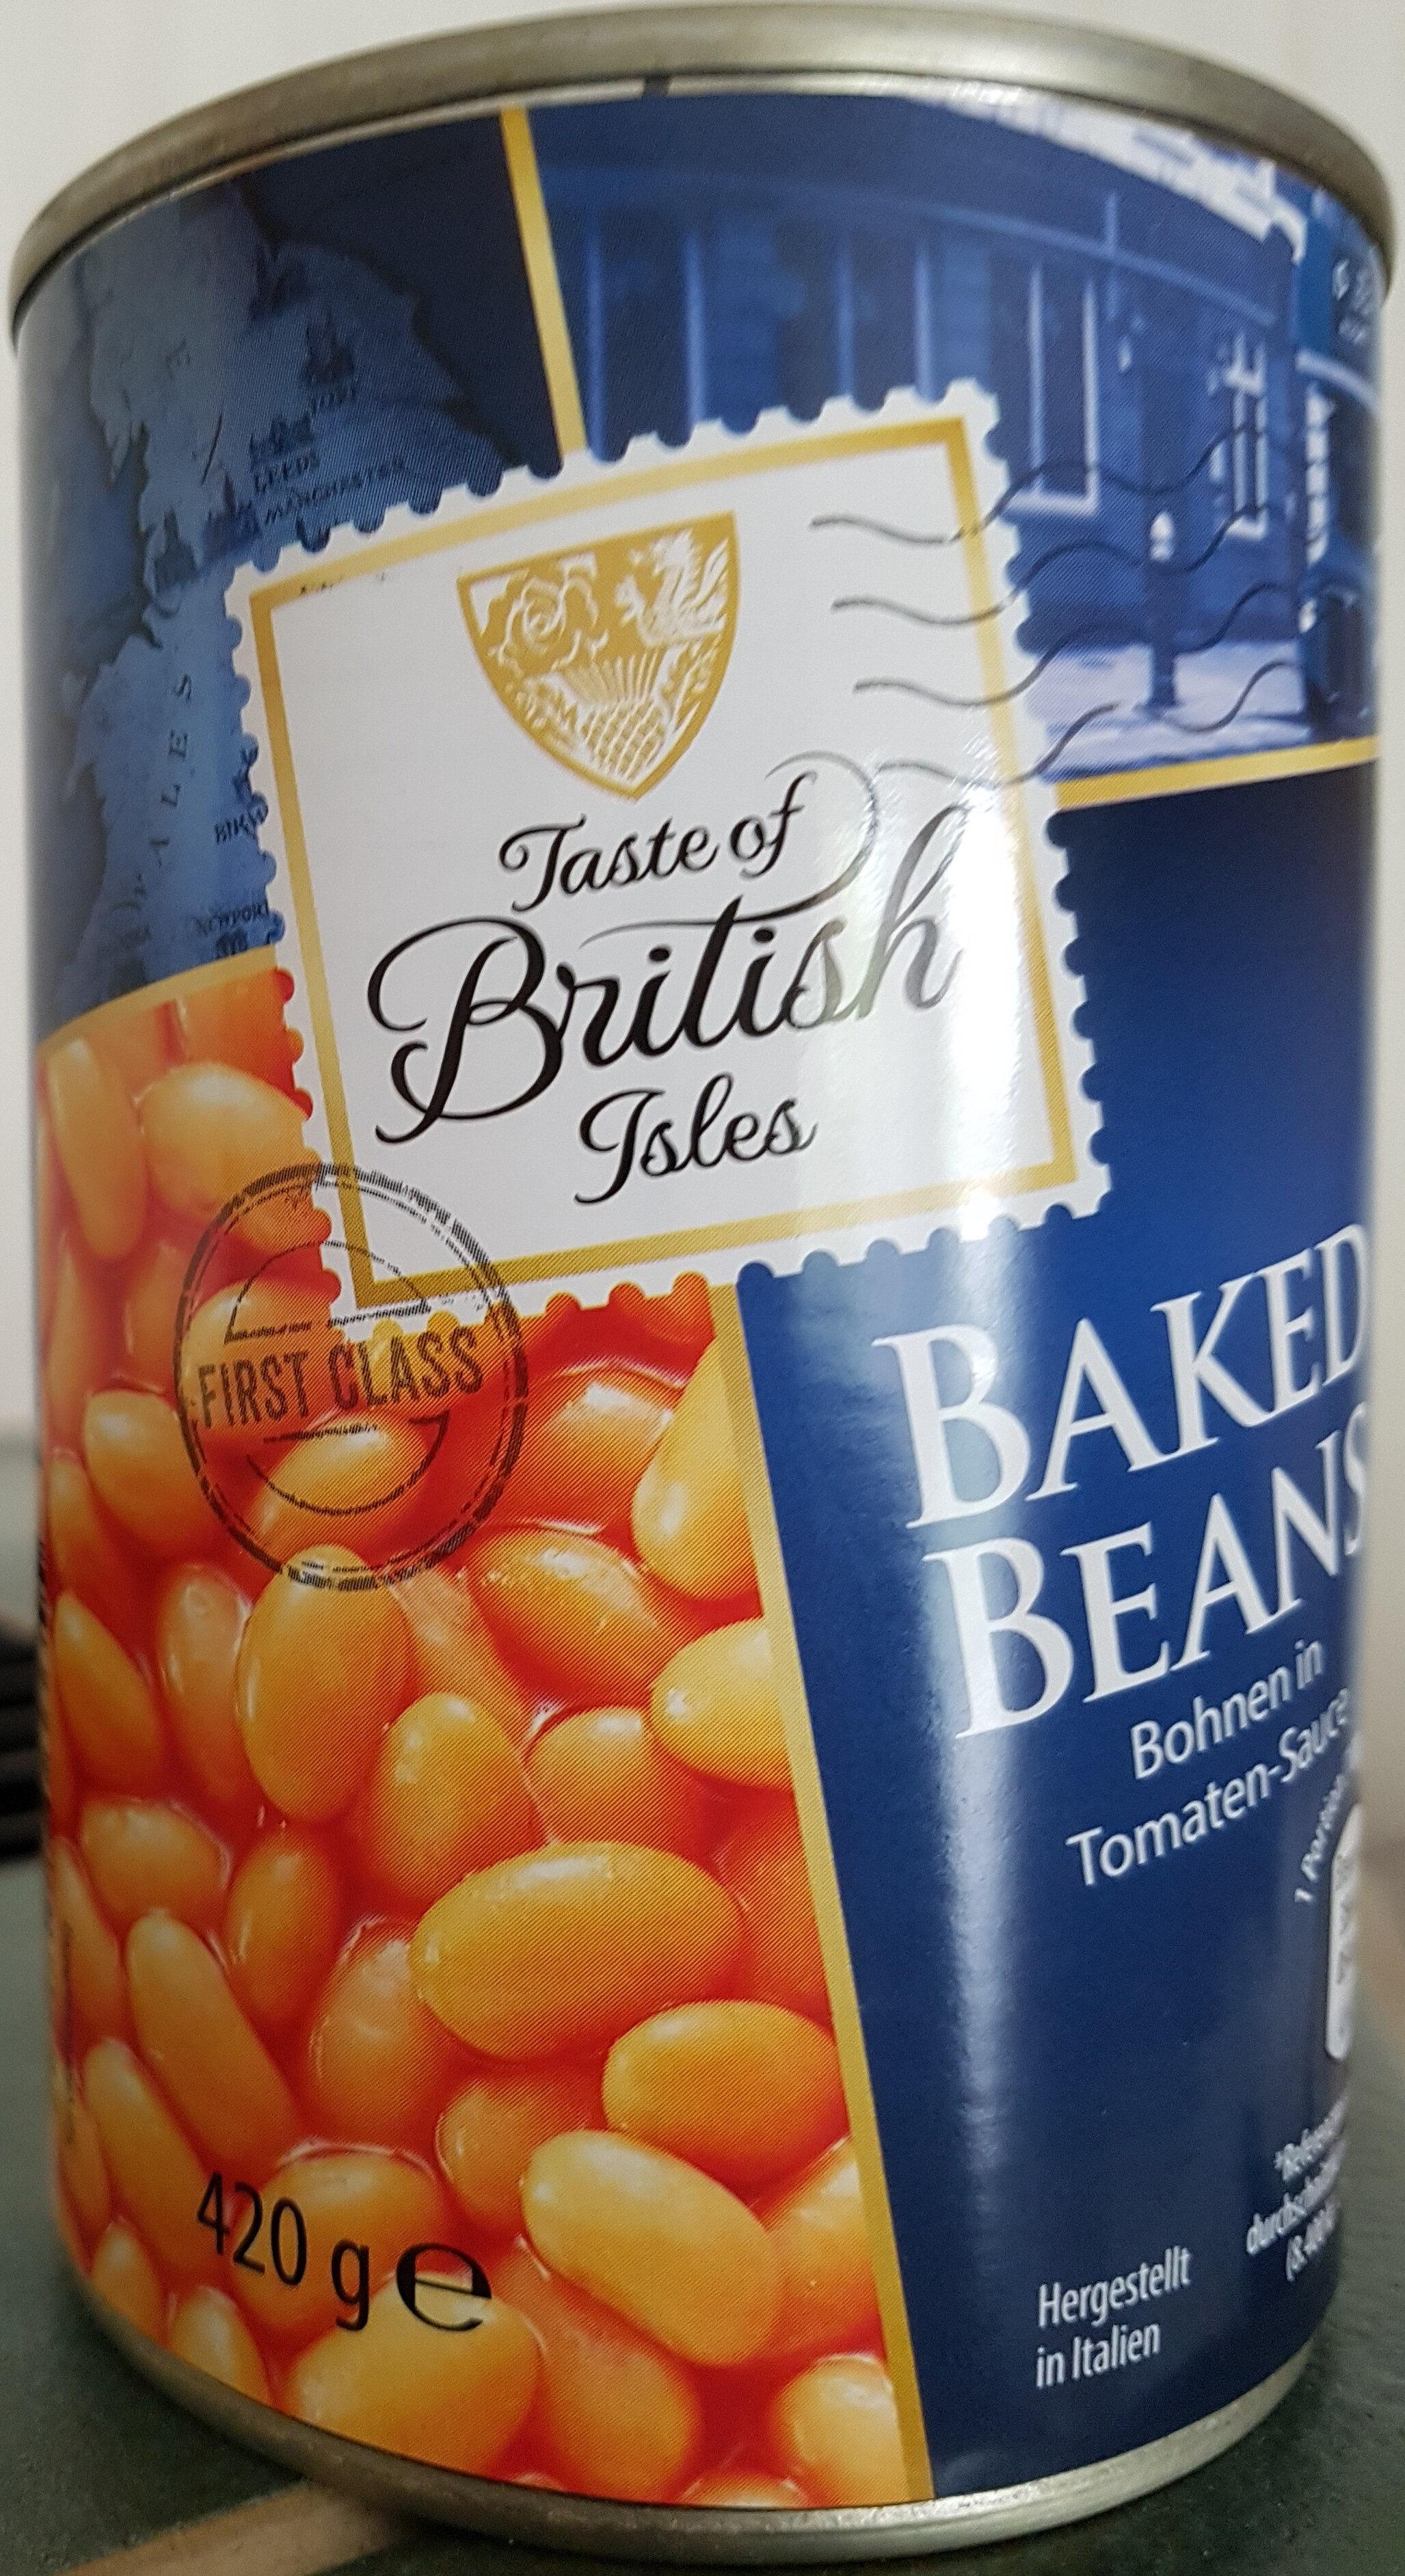 Baked Beans Bohnen in Tomatensauce - Product